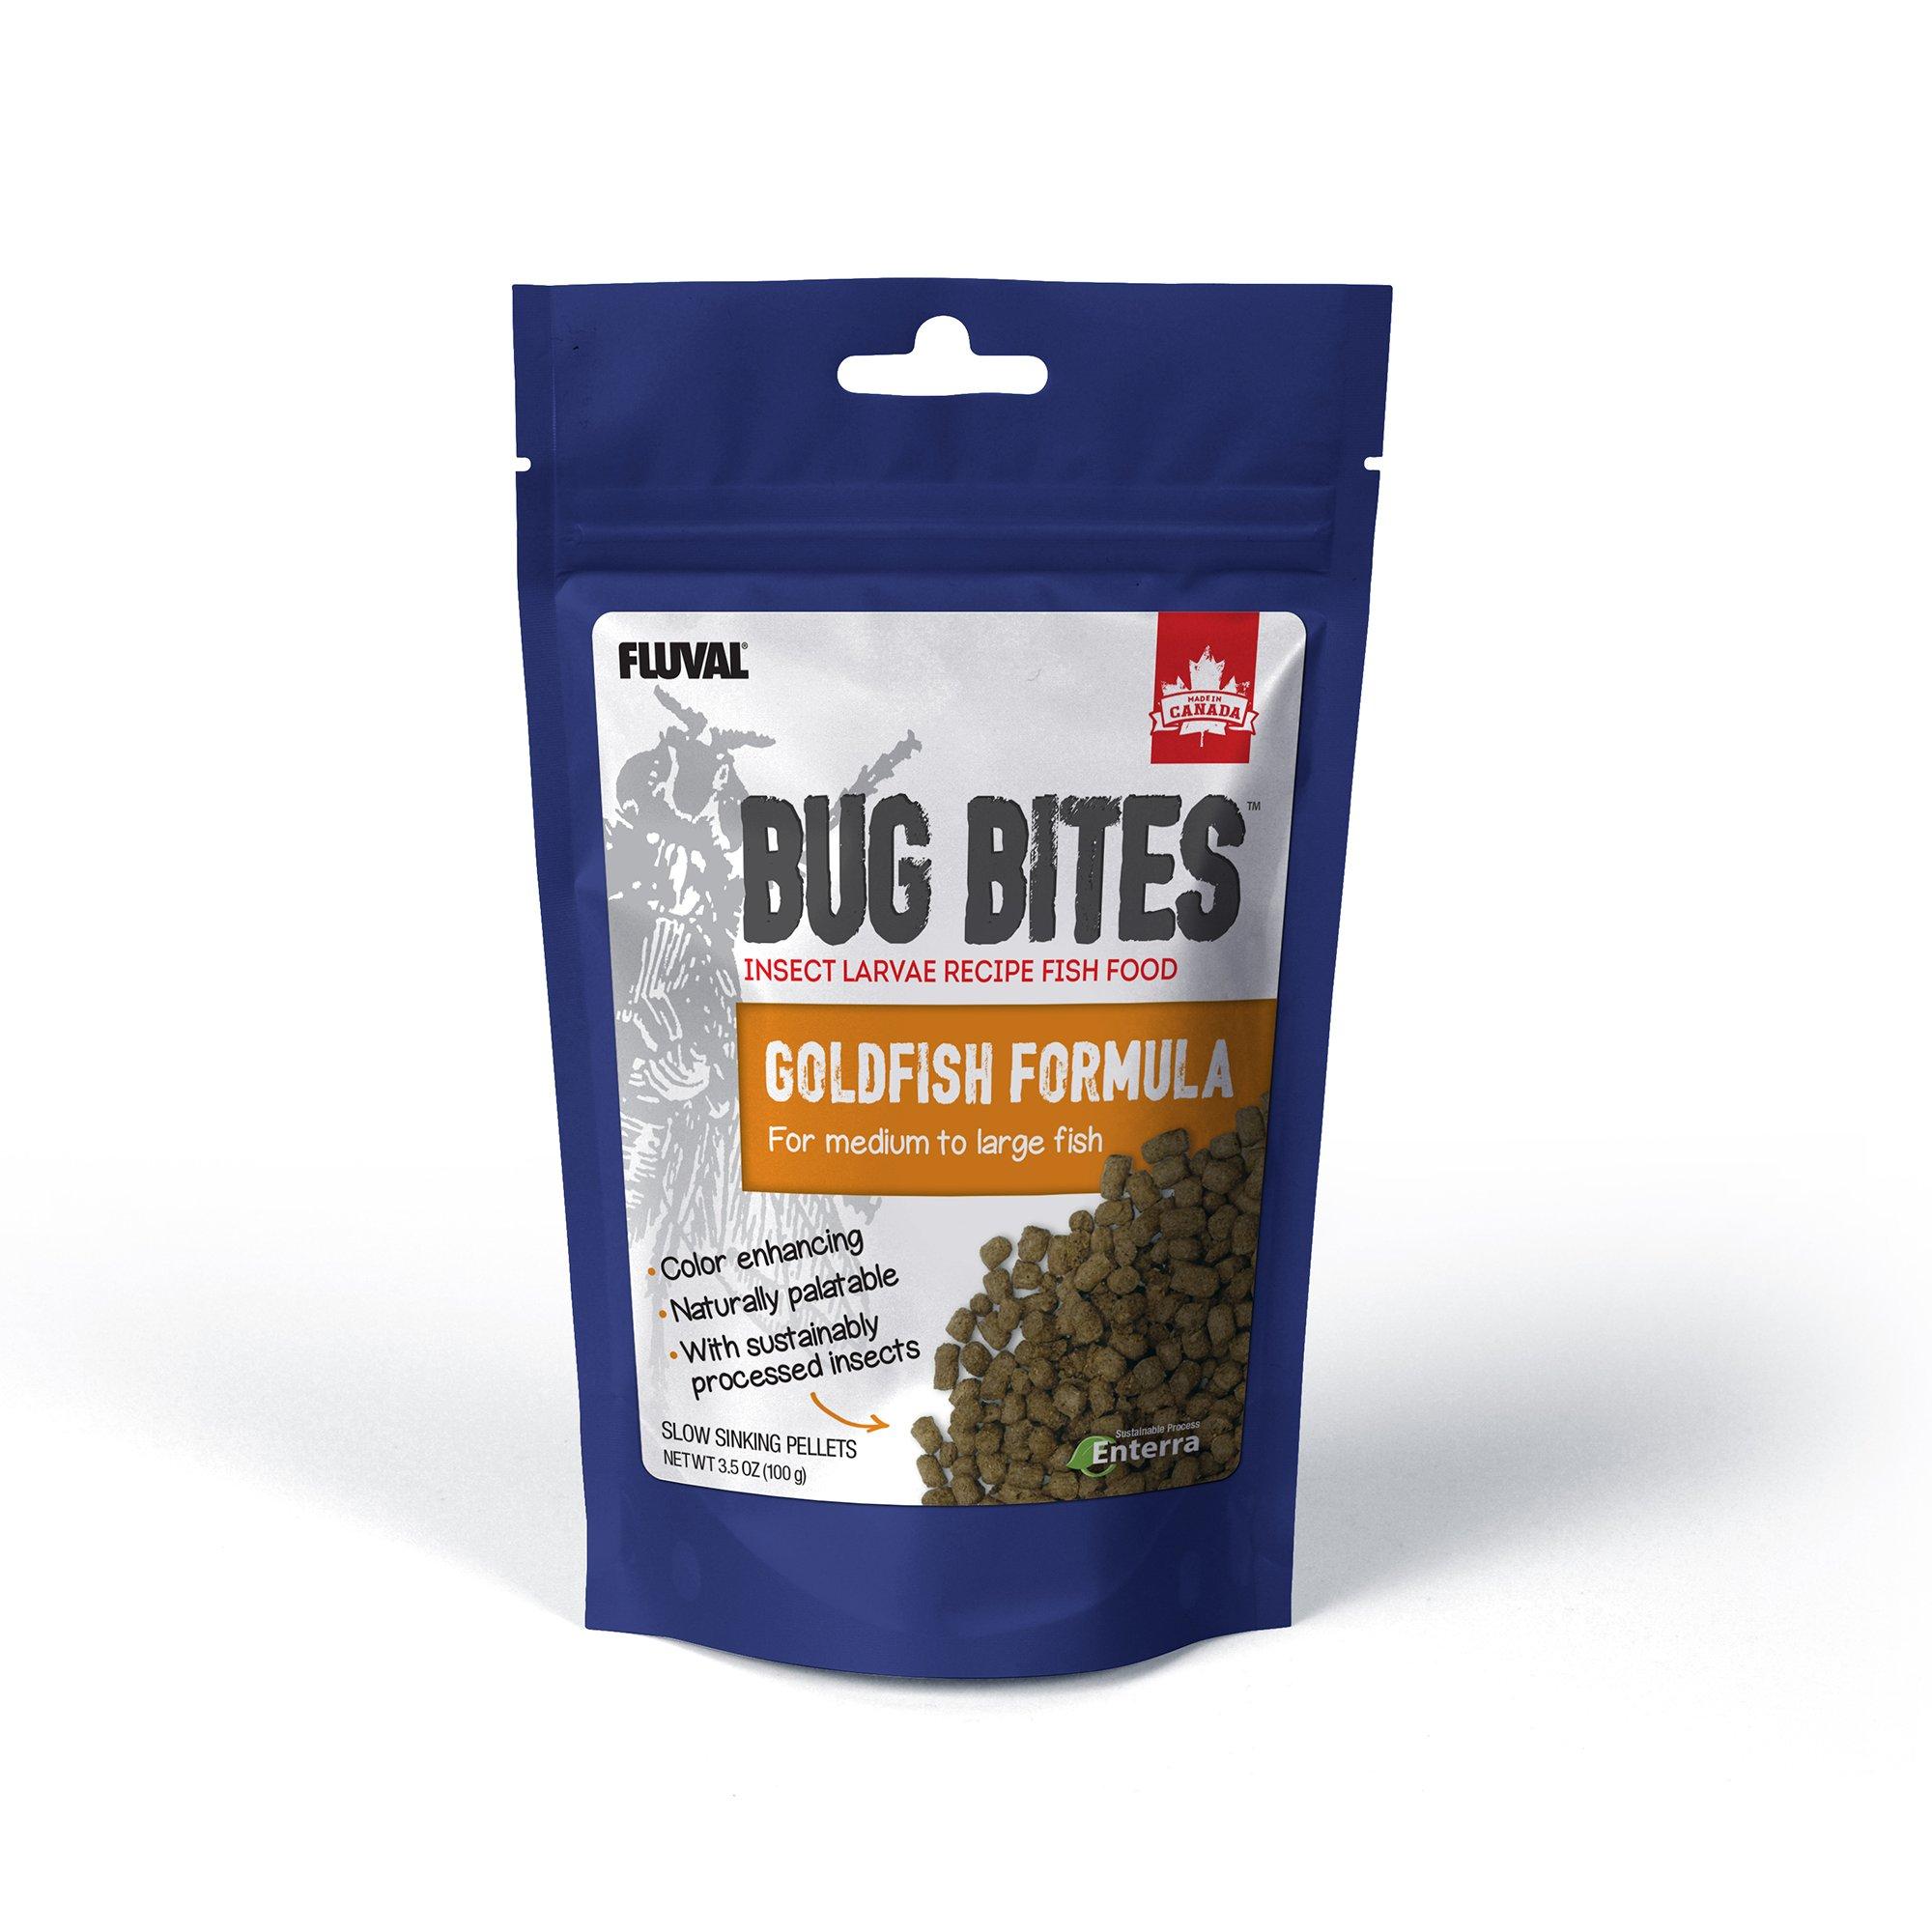 Fluval bug bites pellets for goldfish petco for Feeder fish petco